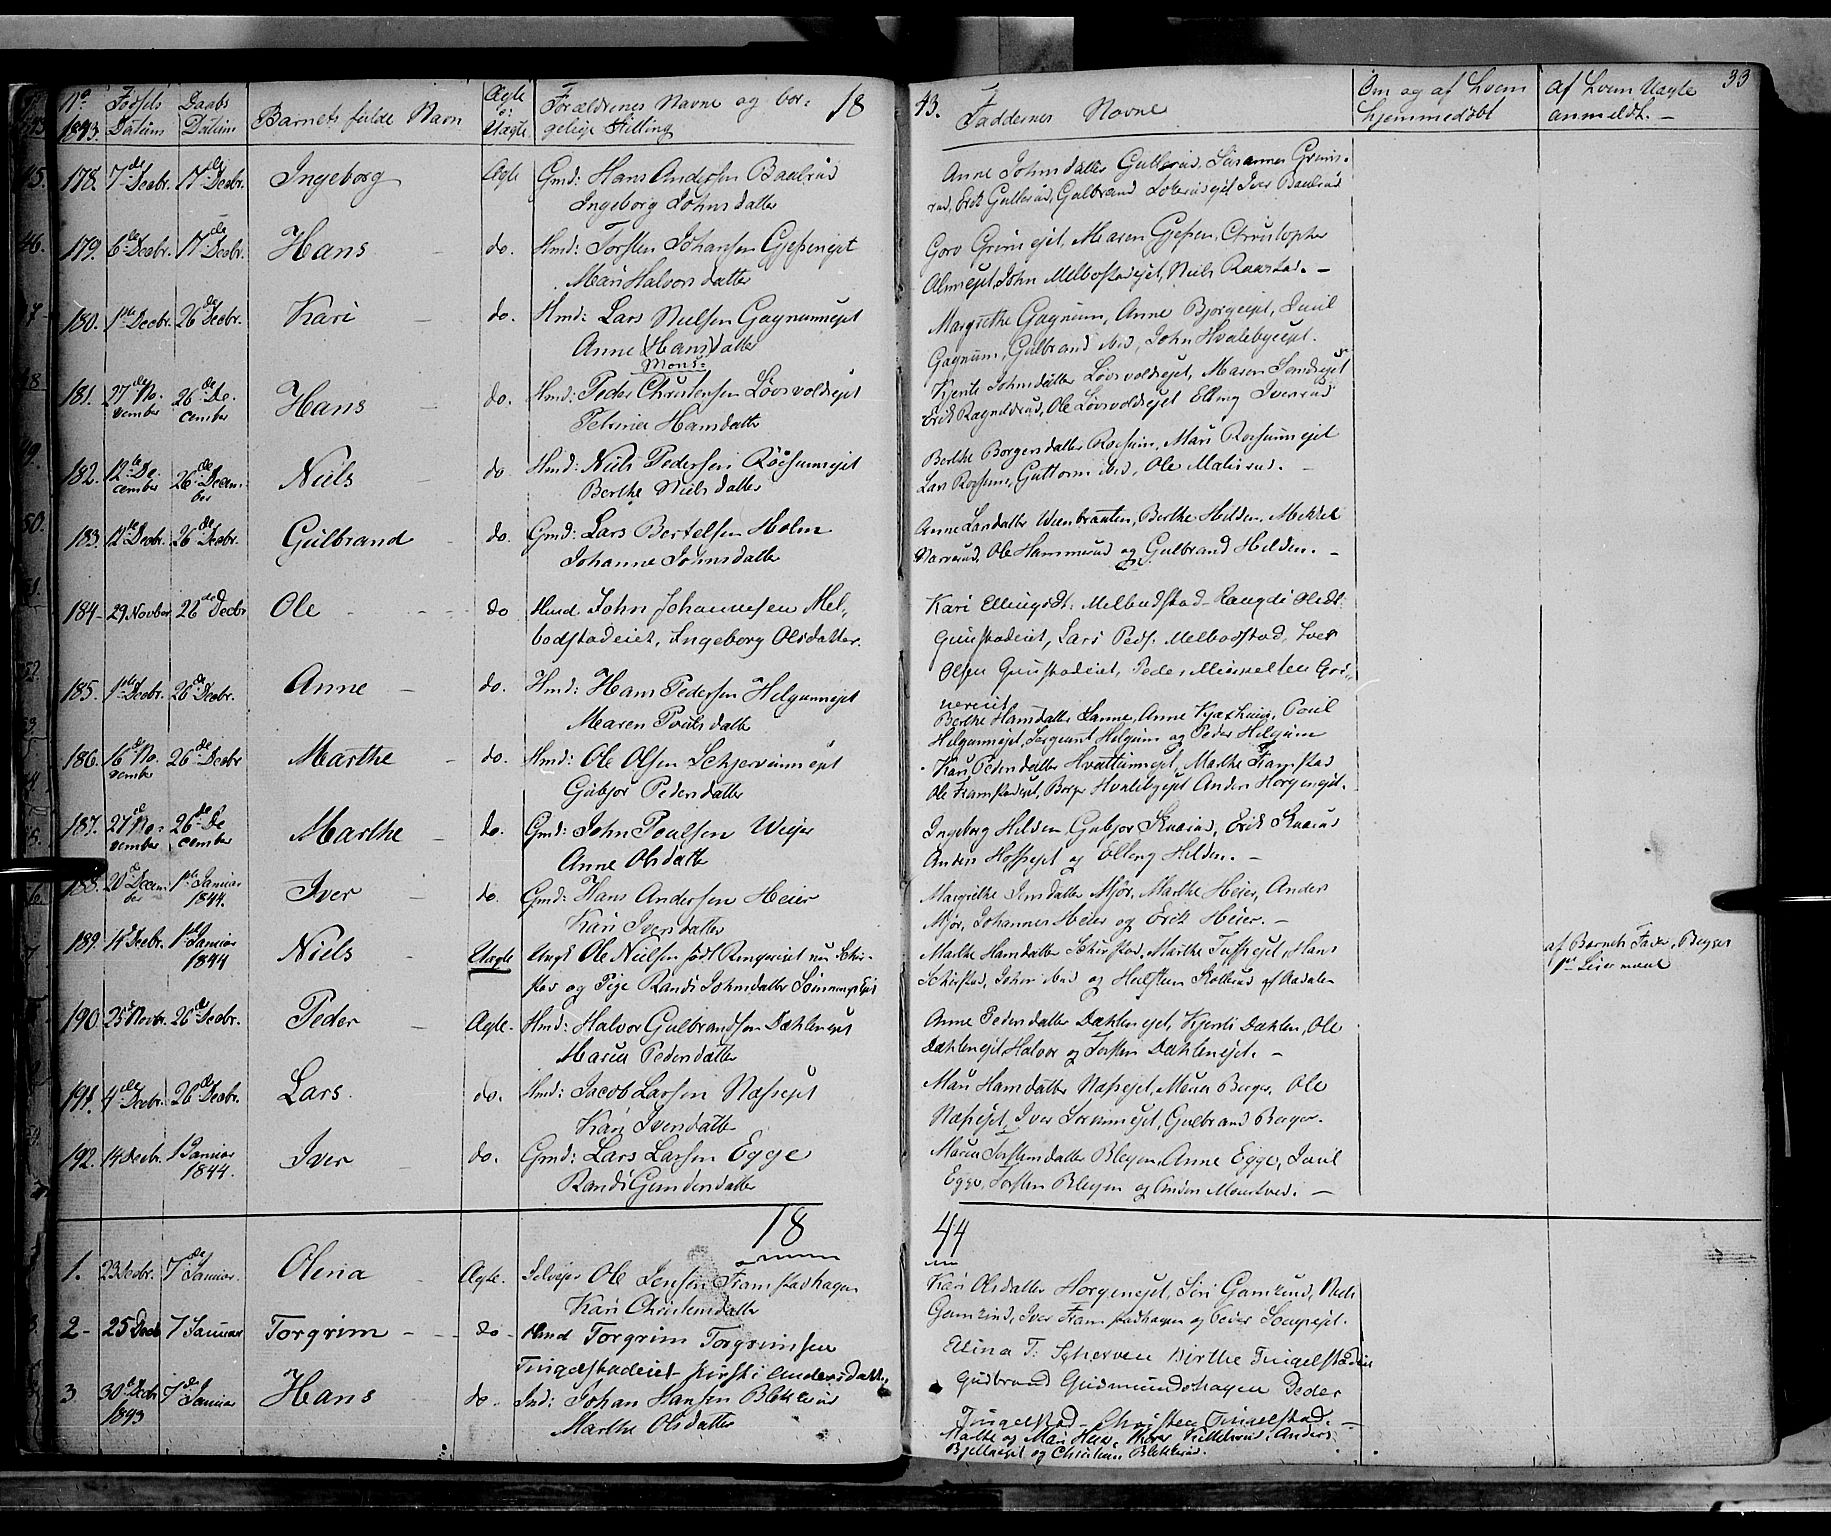 SAH, Gran prestekontor, Ministerialbok nr. 11, 1842-1856, s. 32-33